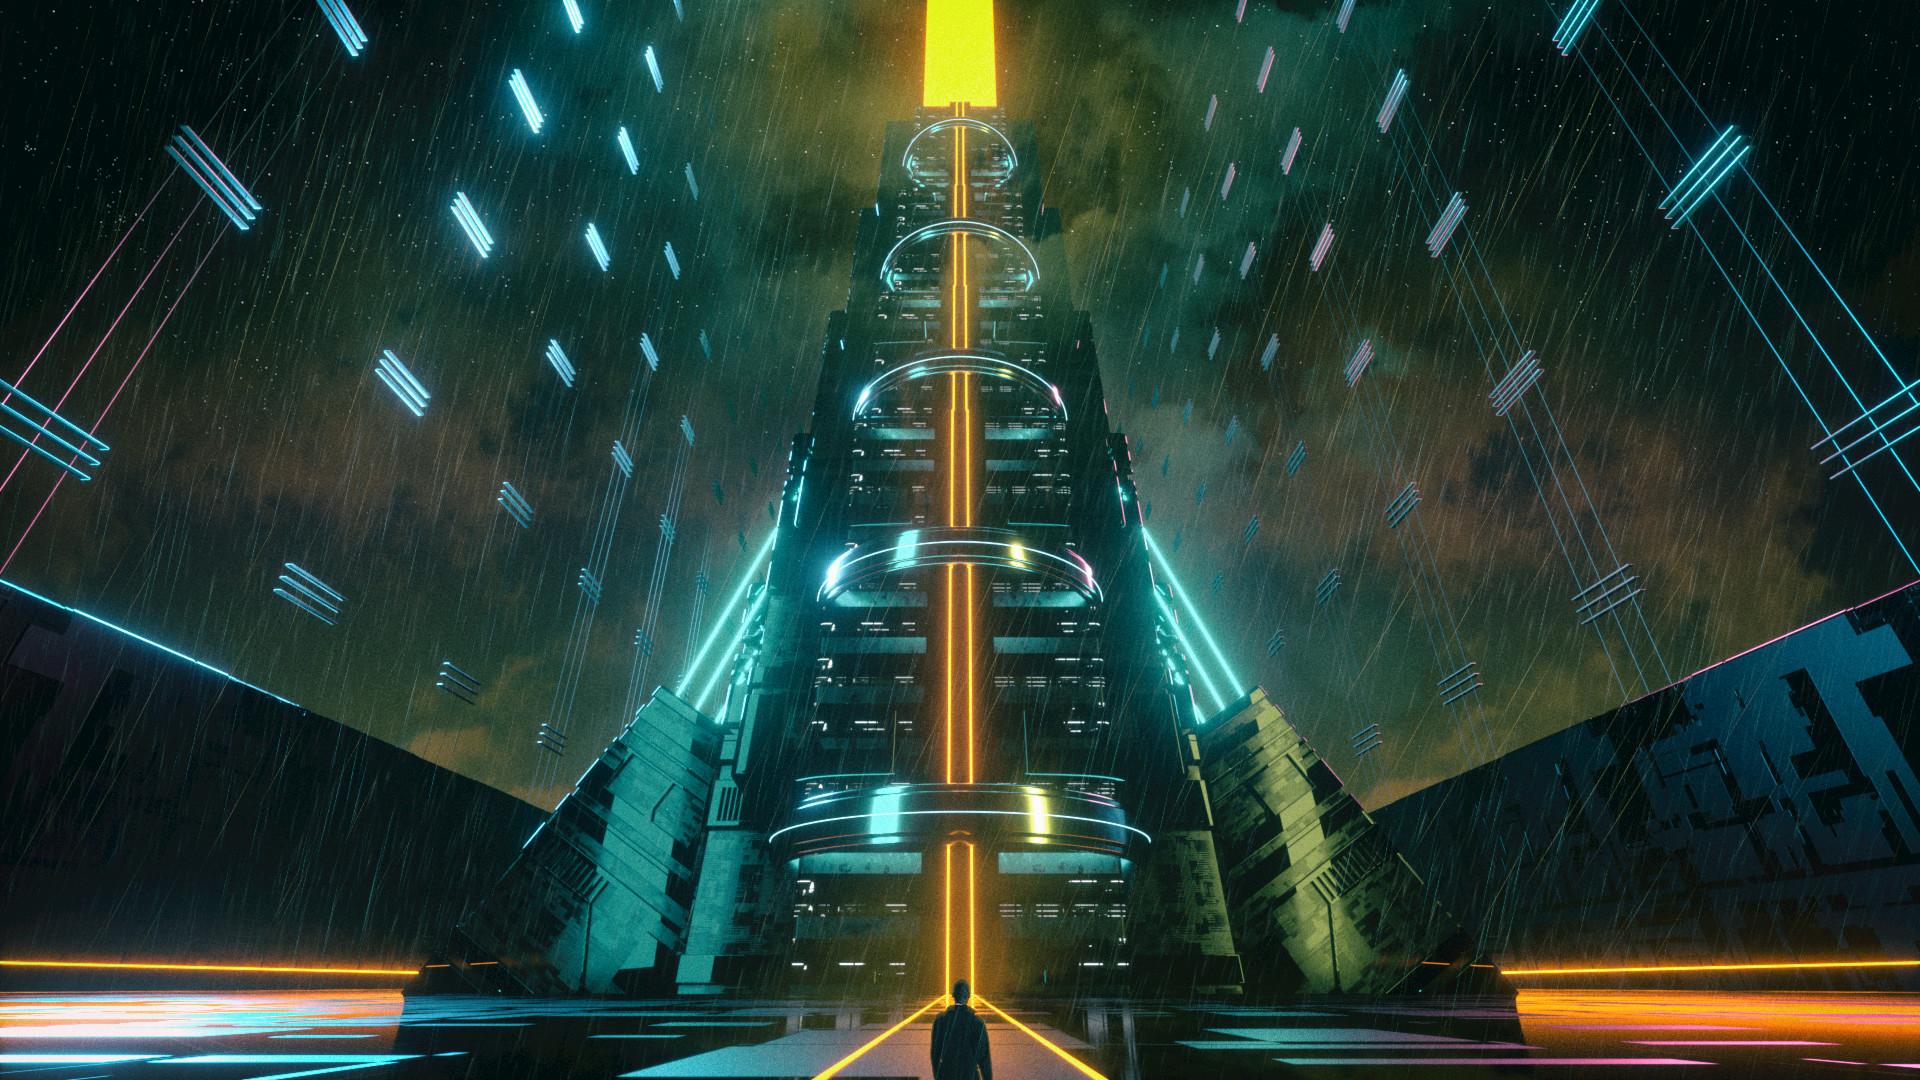 General 1920x1080 David Legnon cyberpunk elevator neon glow orange glowing rain night low-angle frontal view